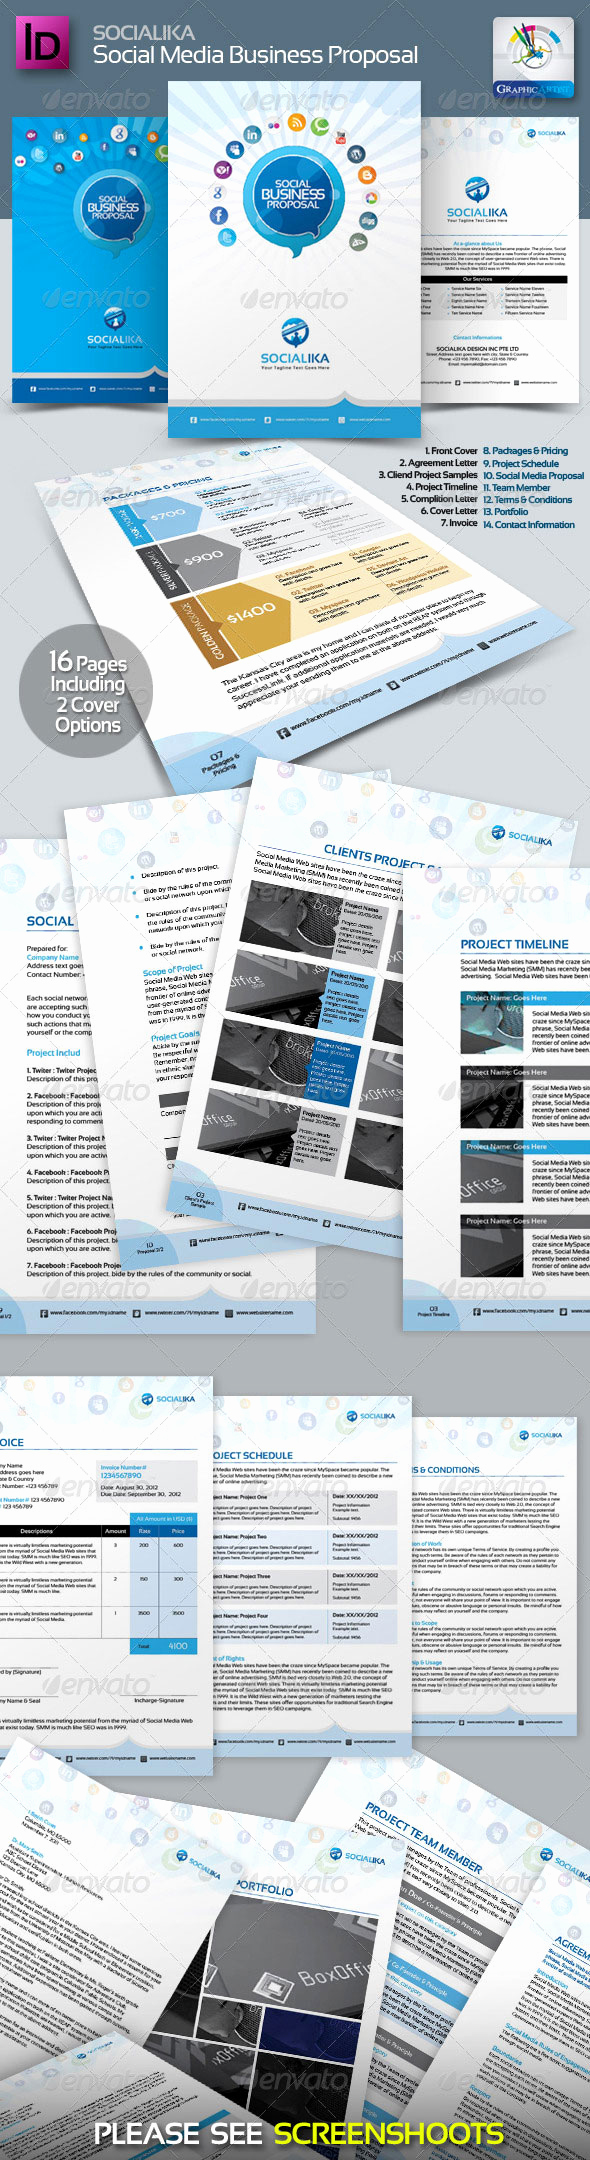 Social Media Proposal Template Beautiful social Media Business Proposal Template